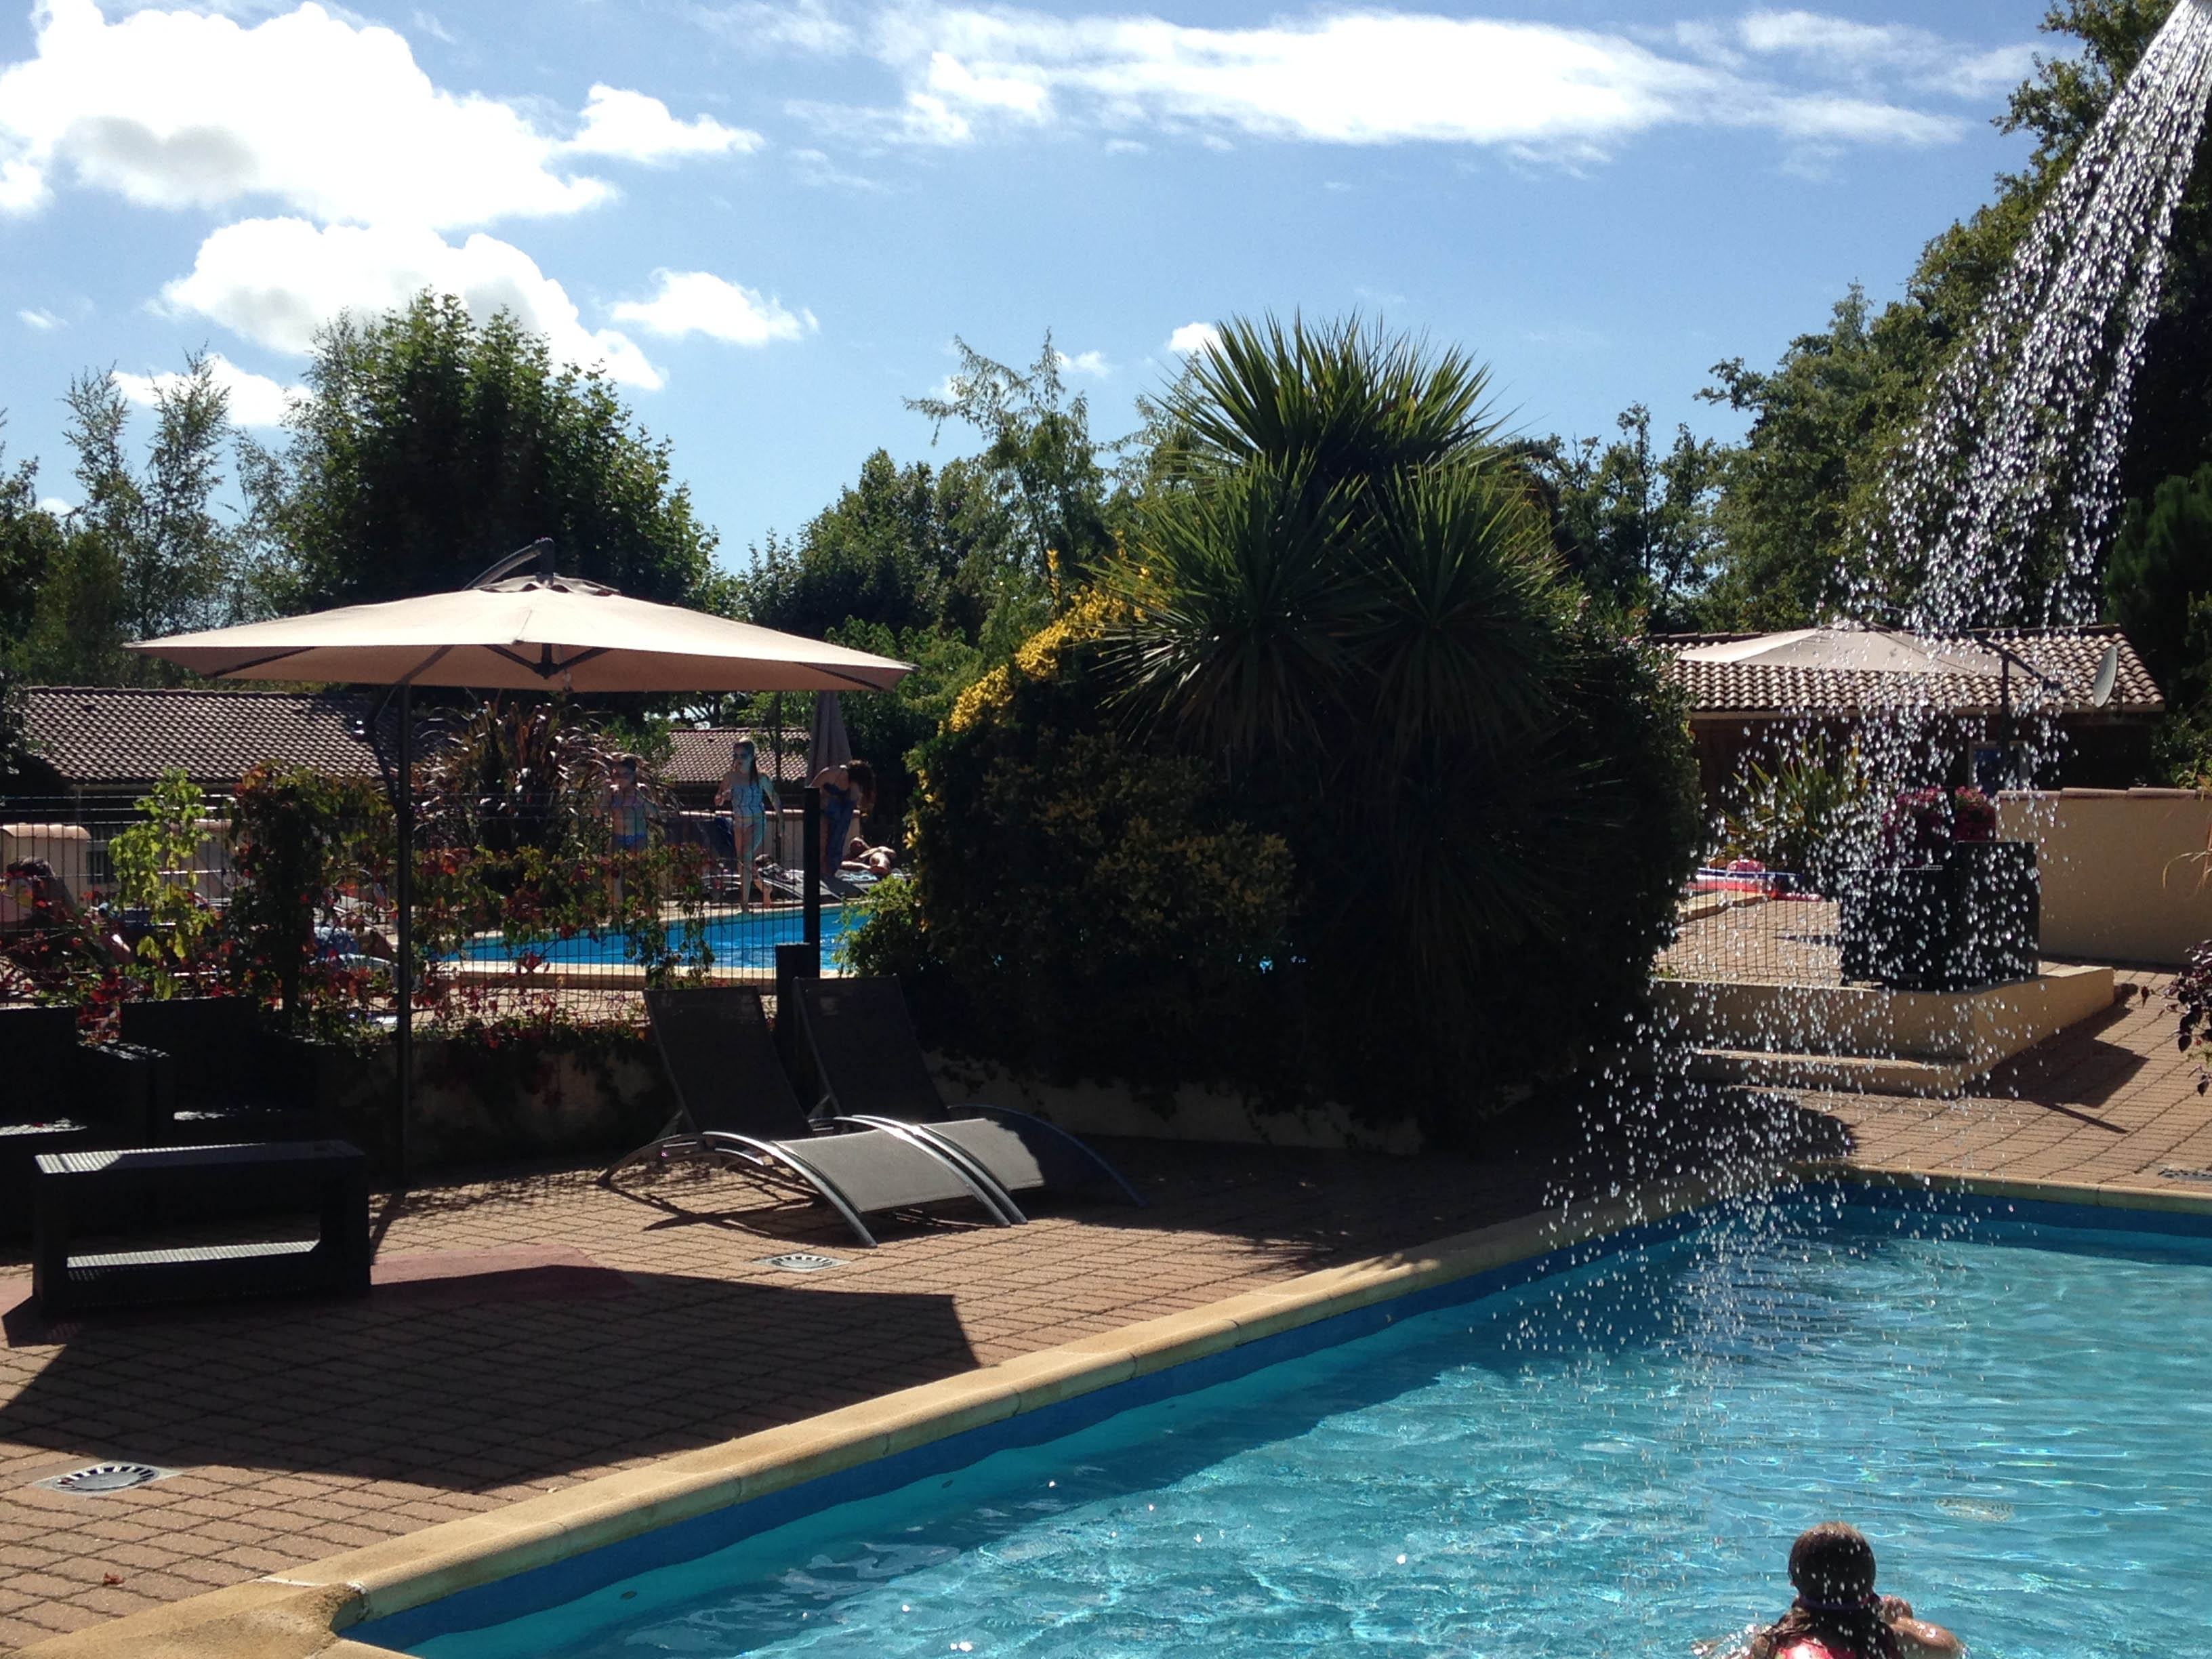 Camping 4 étoiles piscine Ares